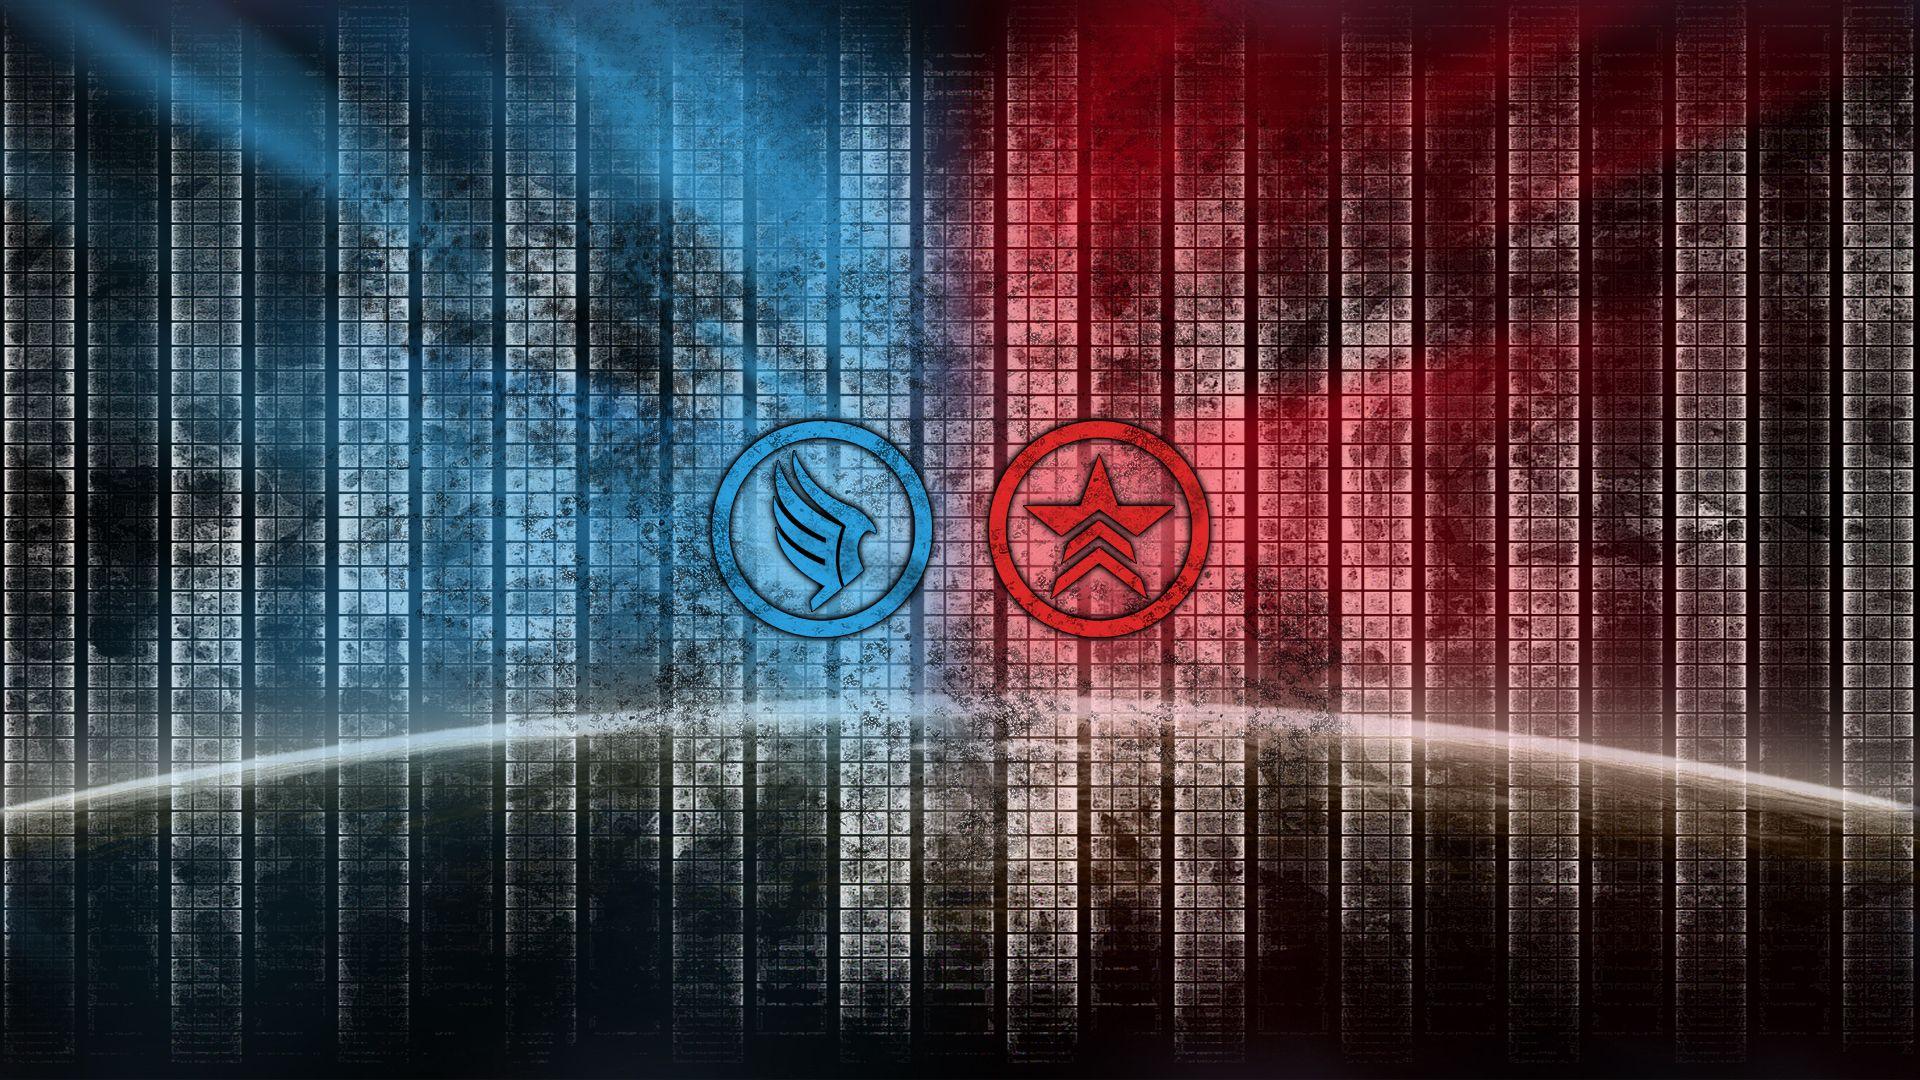 BioWare Mass Effect Media Wallpapers (с изображениями)